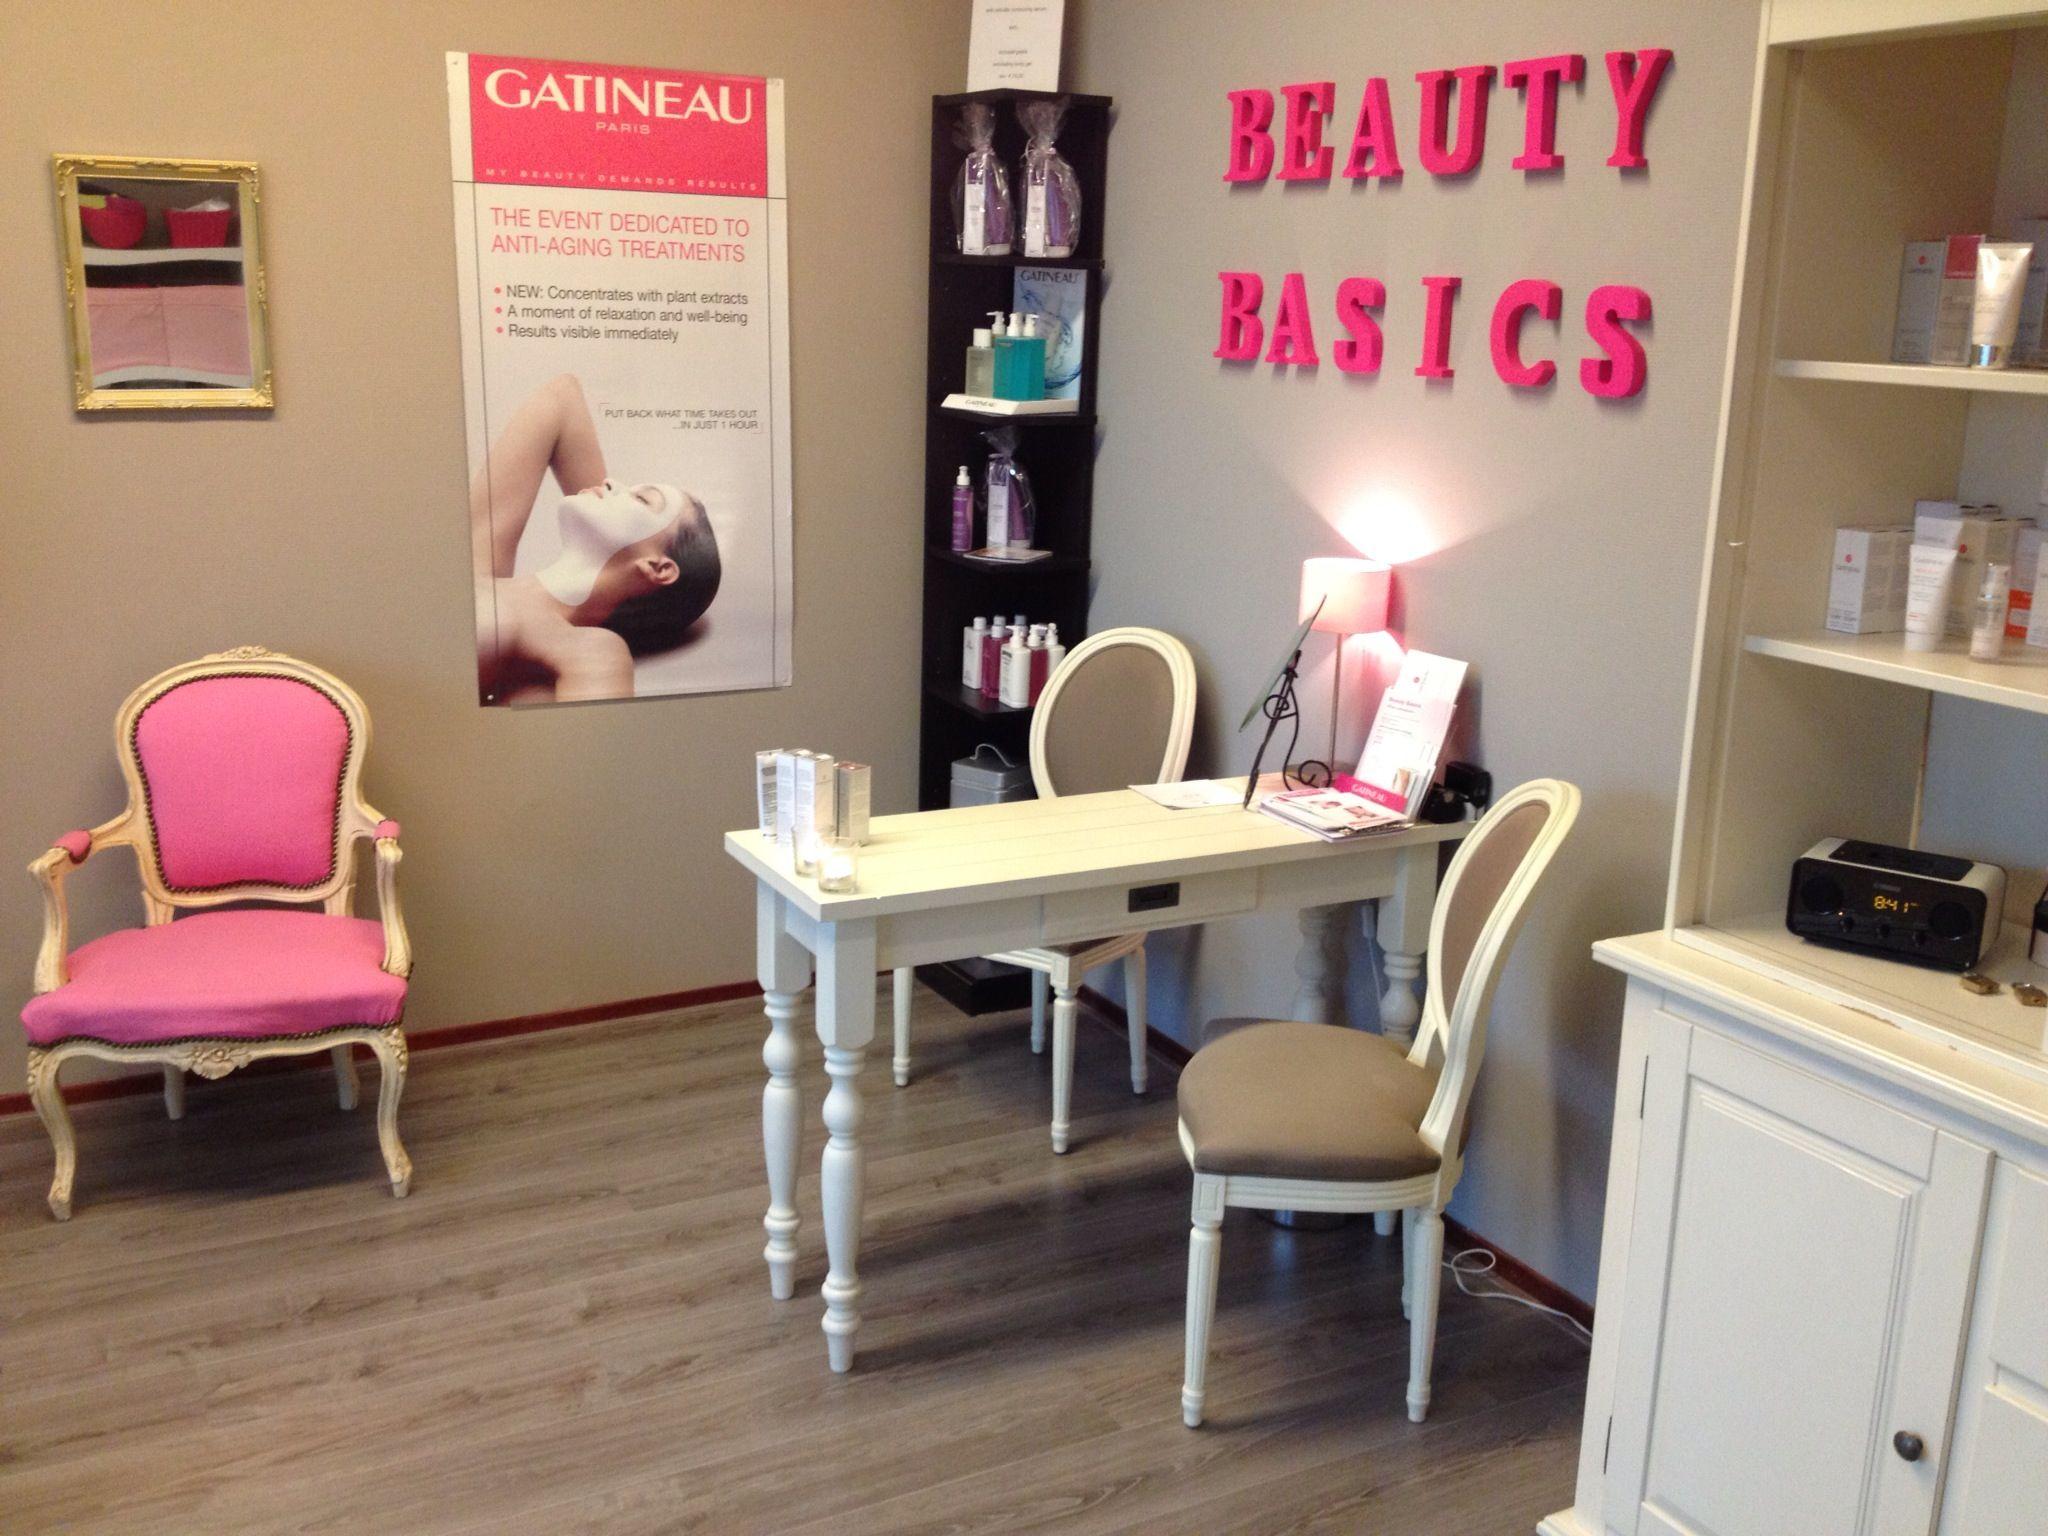 Schoonheidssalon schoonheid pinterest salons spa for Kapsalon interieur